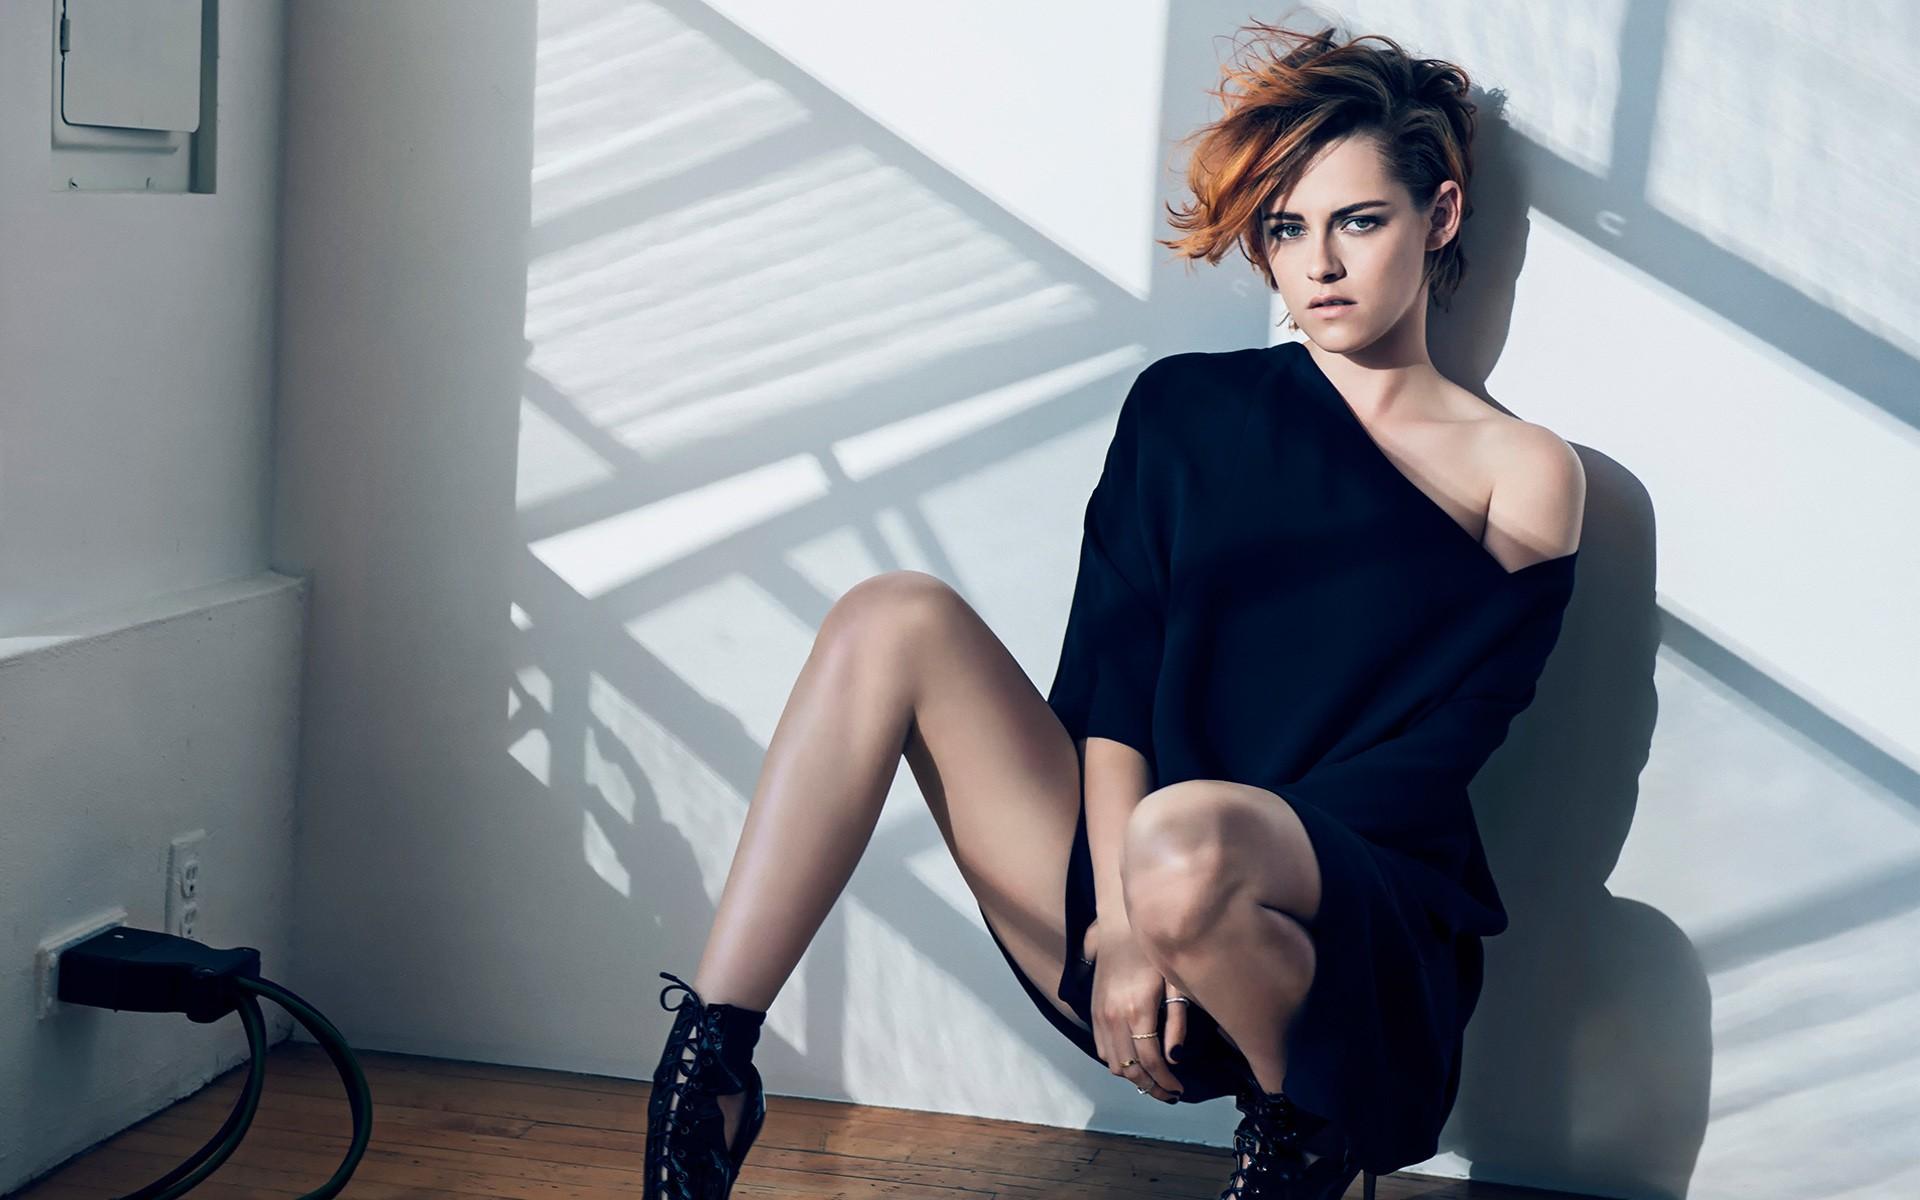 Kristen Stewart 5 HD Celebrities 4k Wallpapers Images